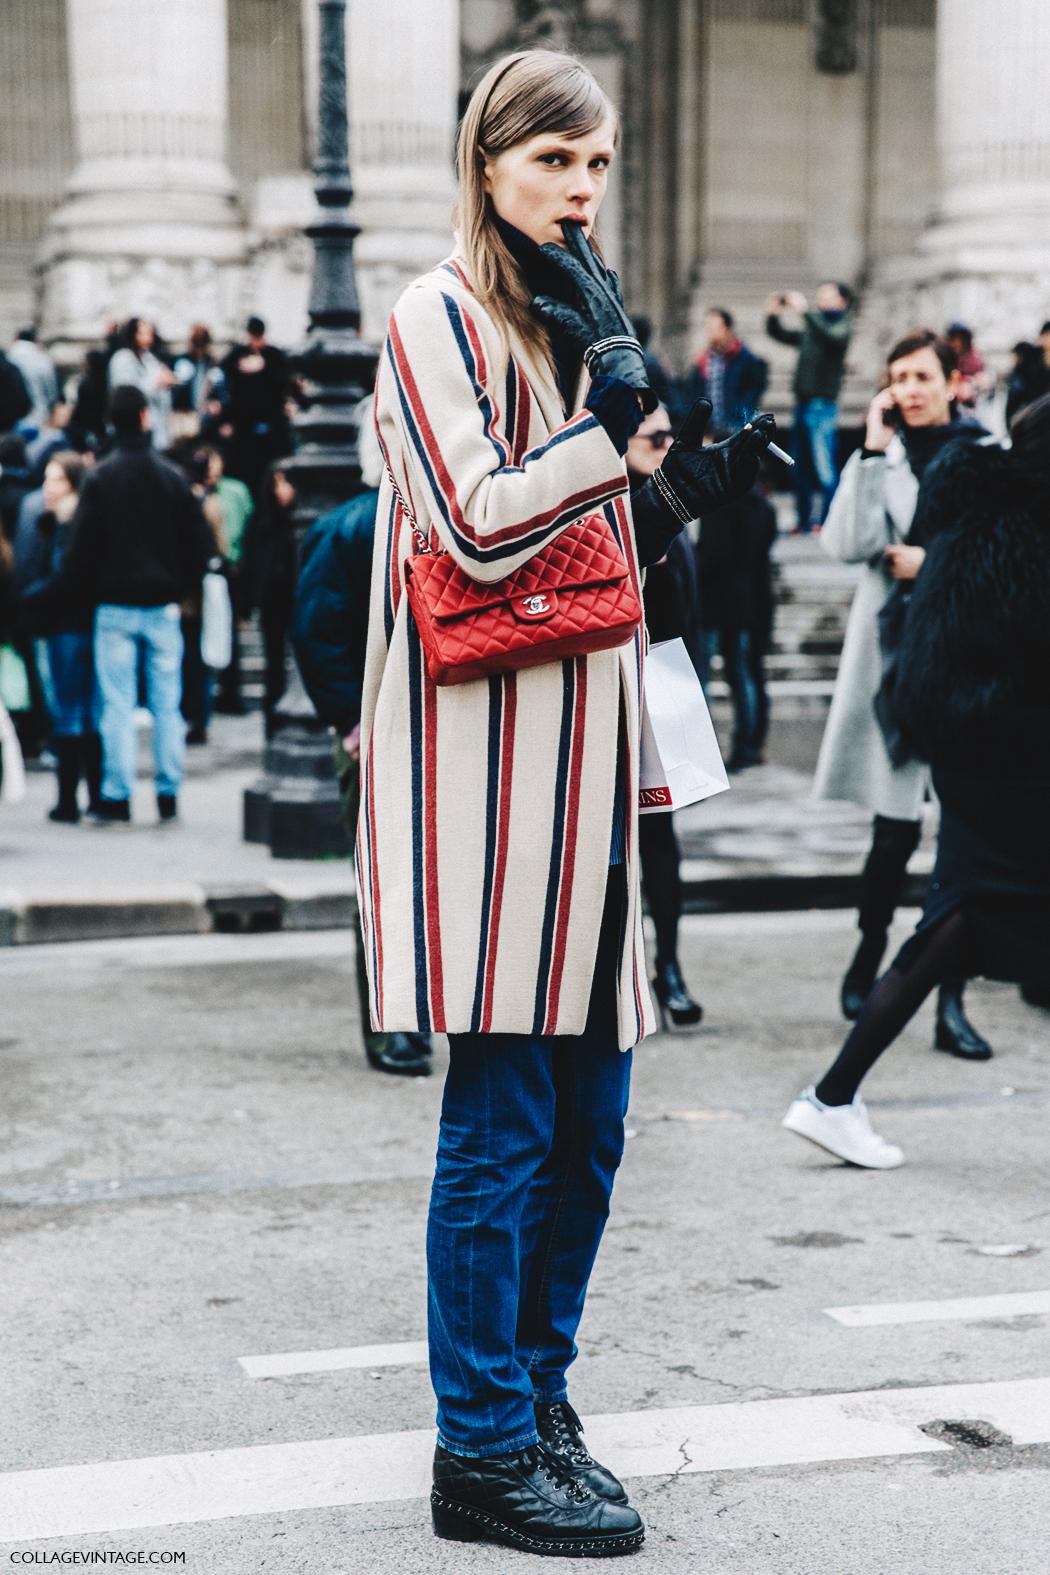 PFW-Paris_Fashion_Week_Fall_2016-Street_Style-Collage_Vintage-Caroline_Brasch-Striped_Coat-Chanel_Bag-